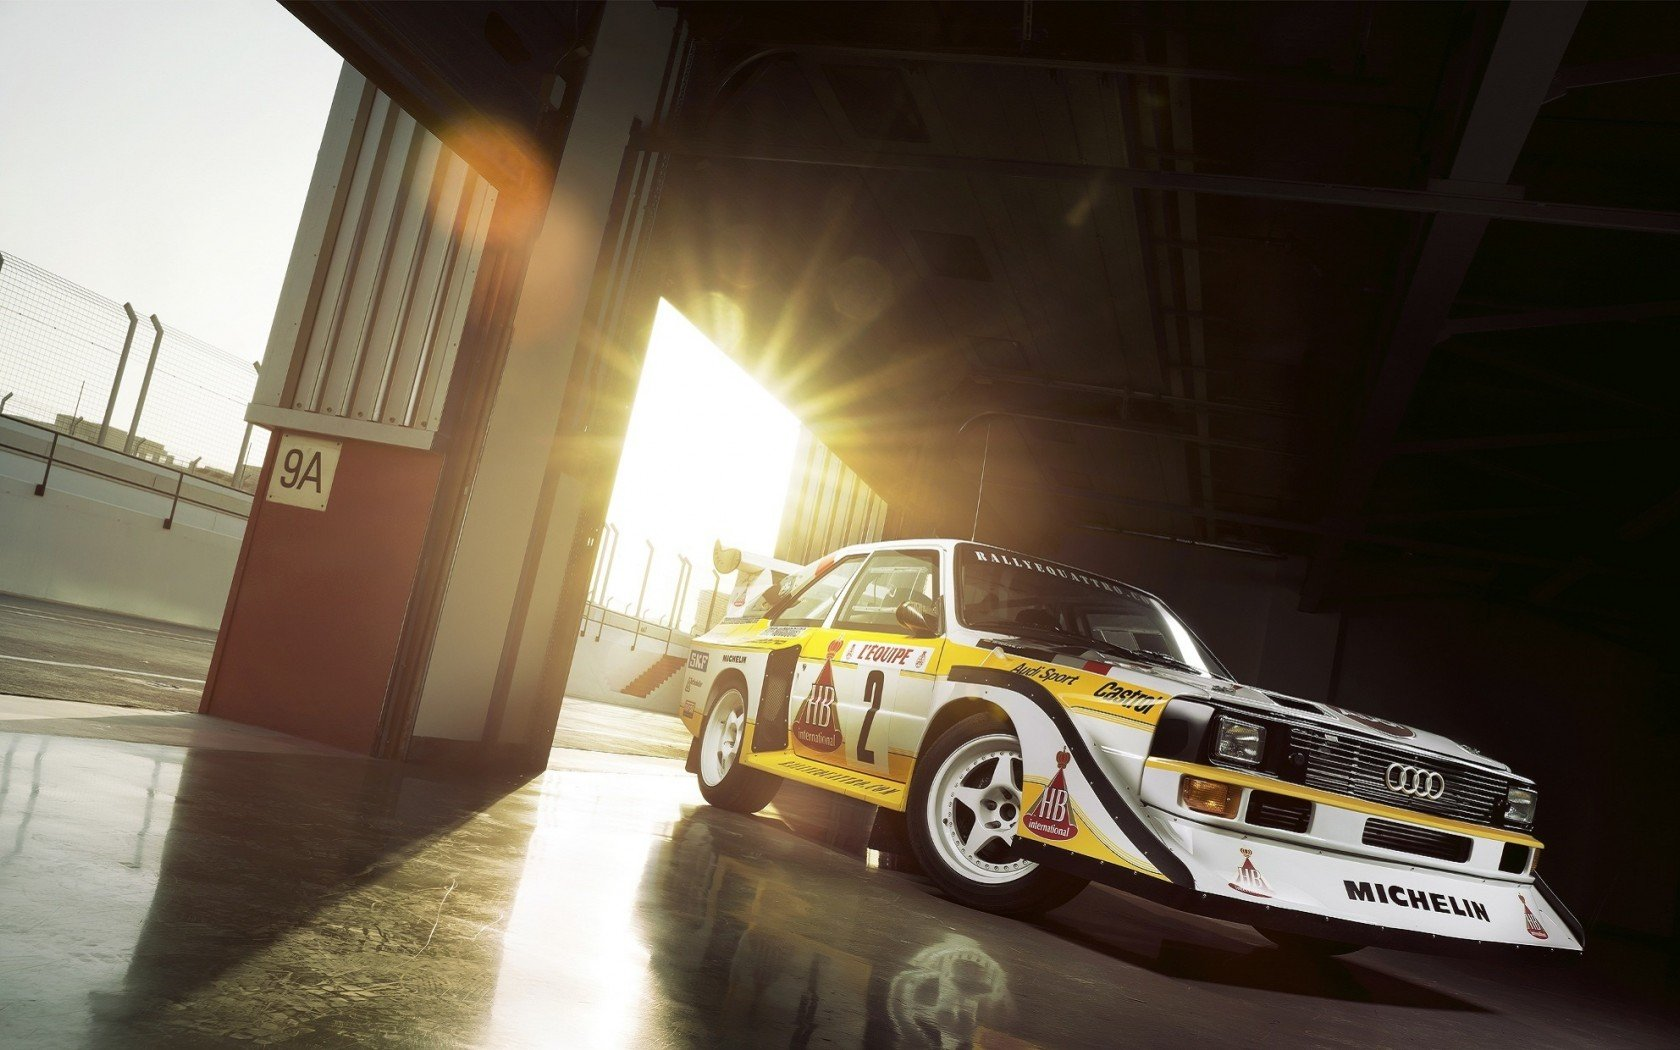 Audi Quattro S1 Rally Car Legend Group B wallpaper 1680x1050 1680x1050